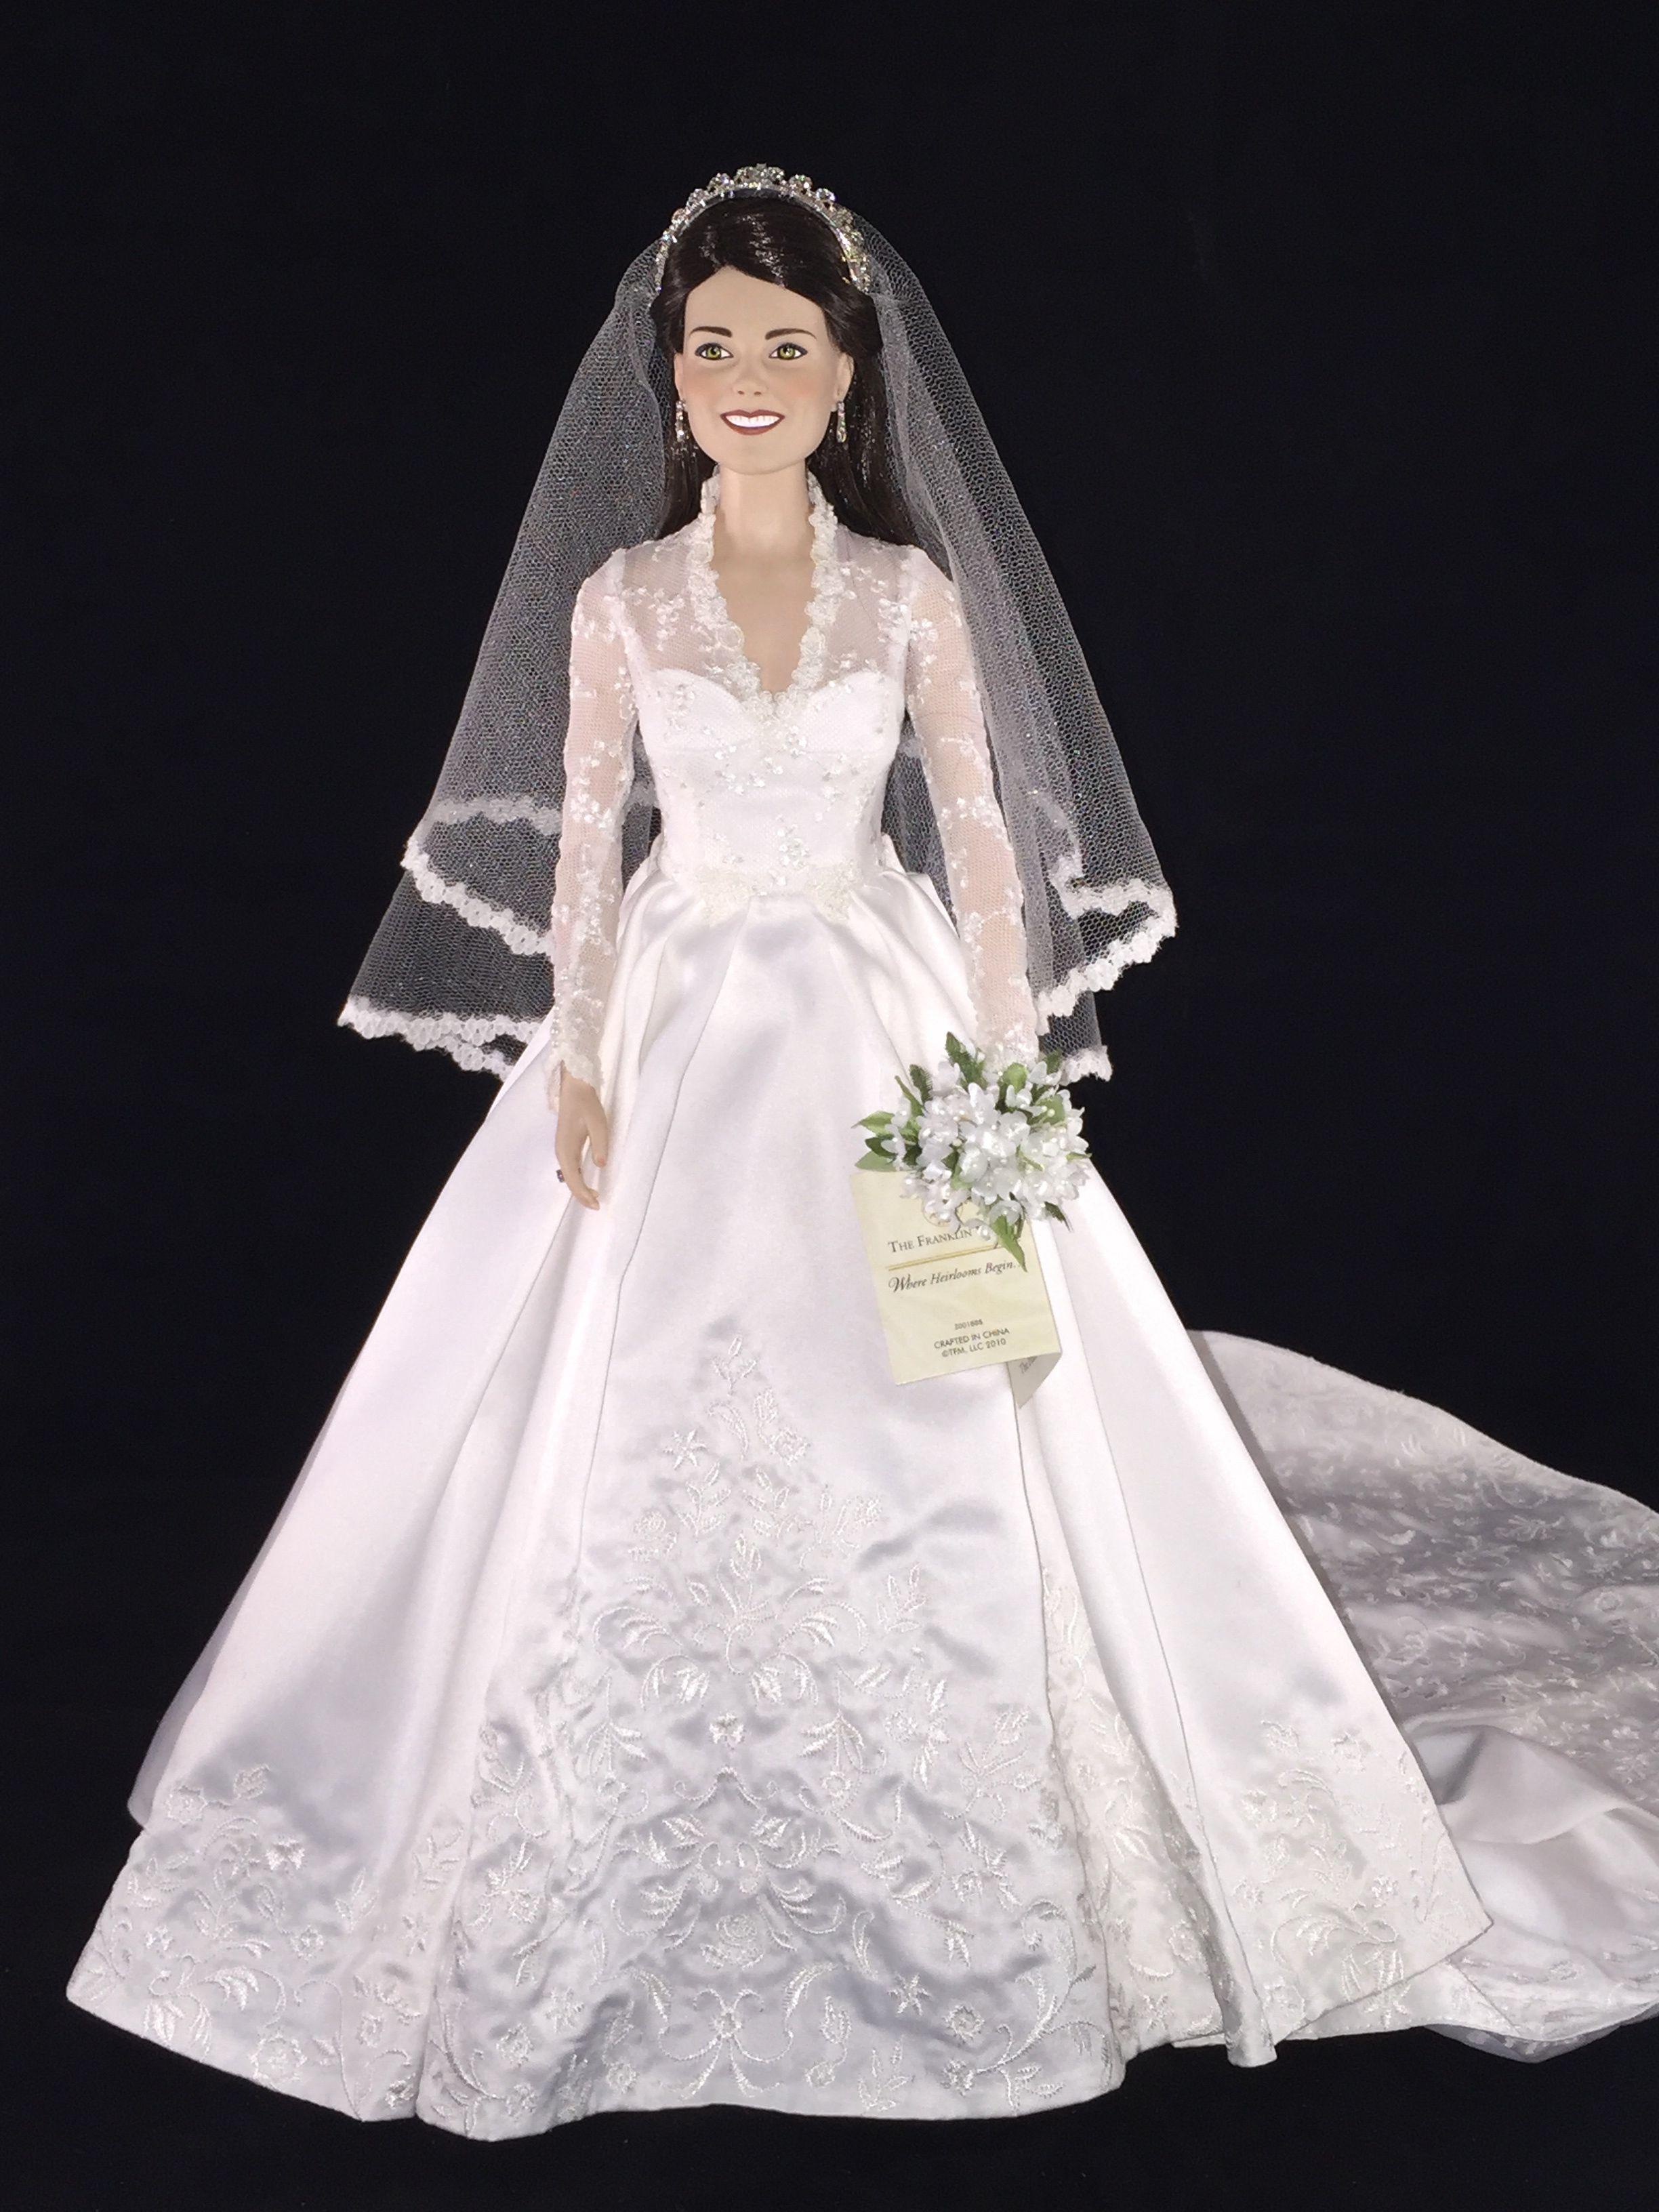 franklin mint kate middleton bridal doll kate s dress was